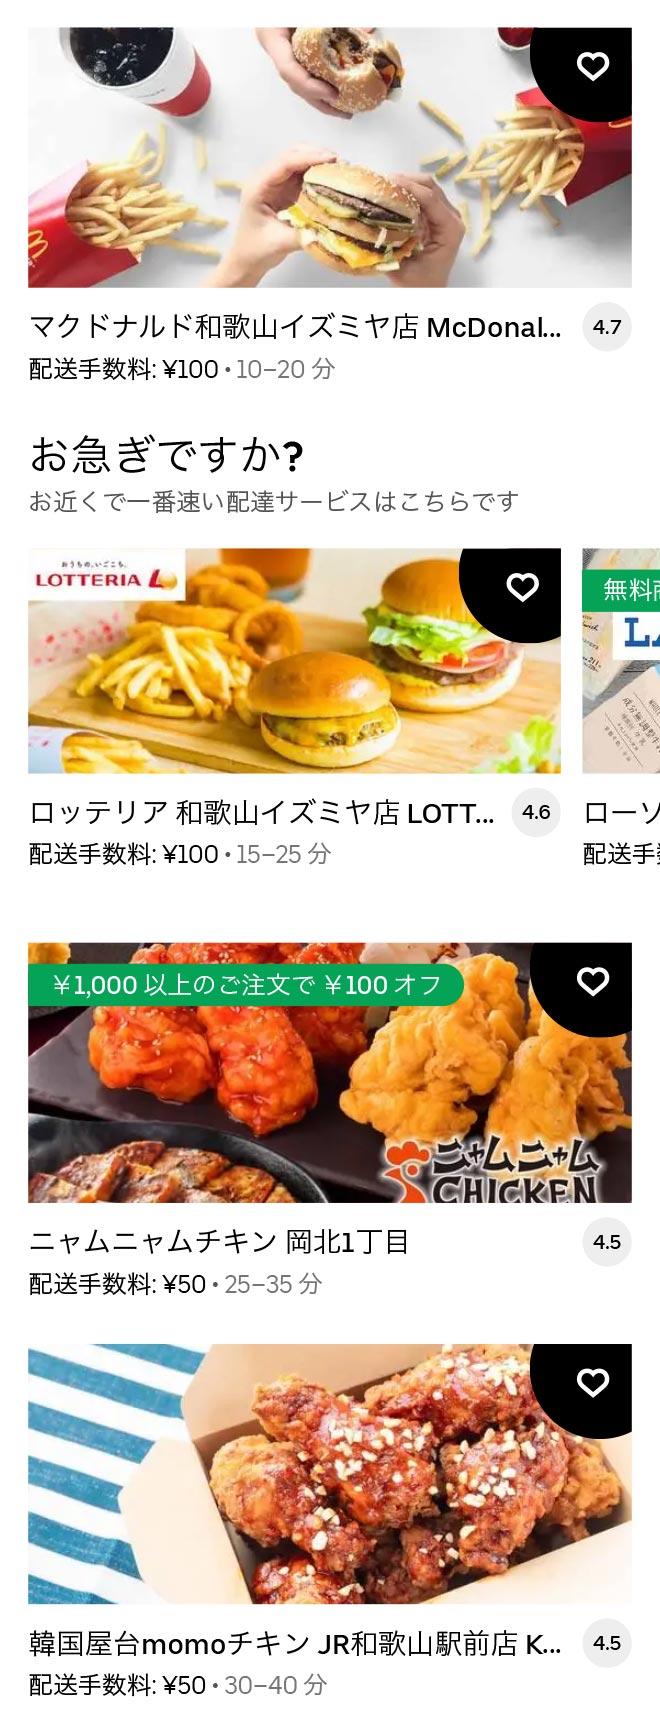 U wakayama menu 2104 01